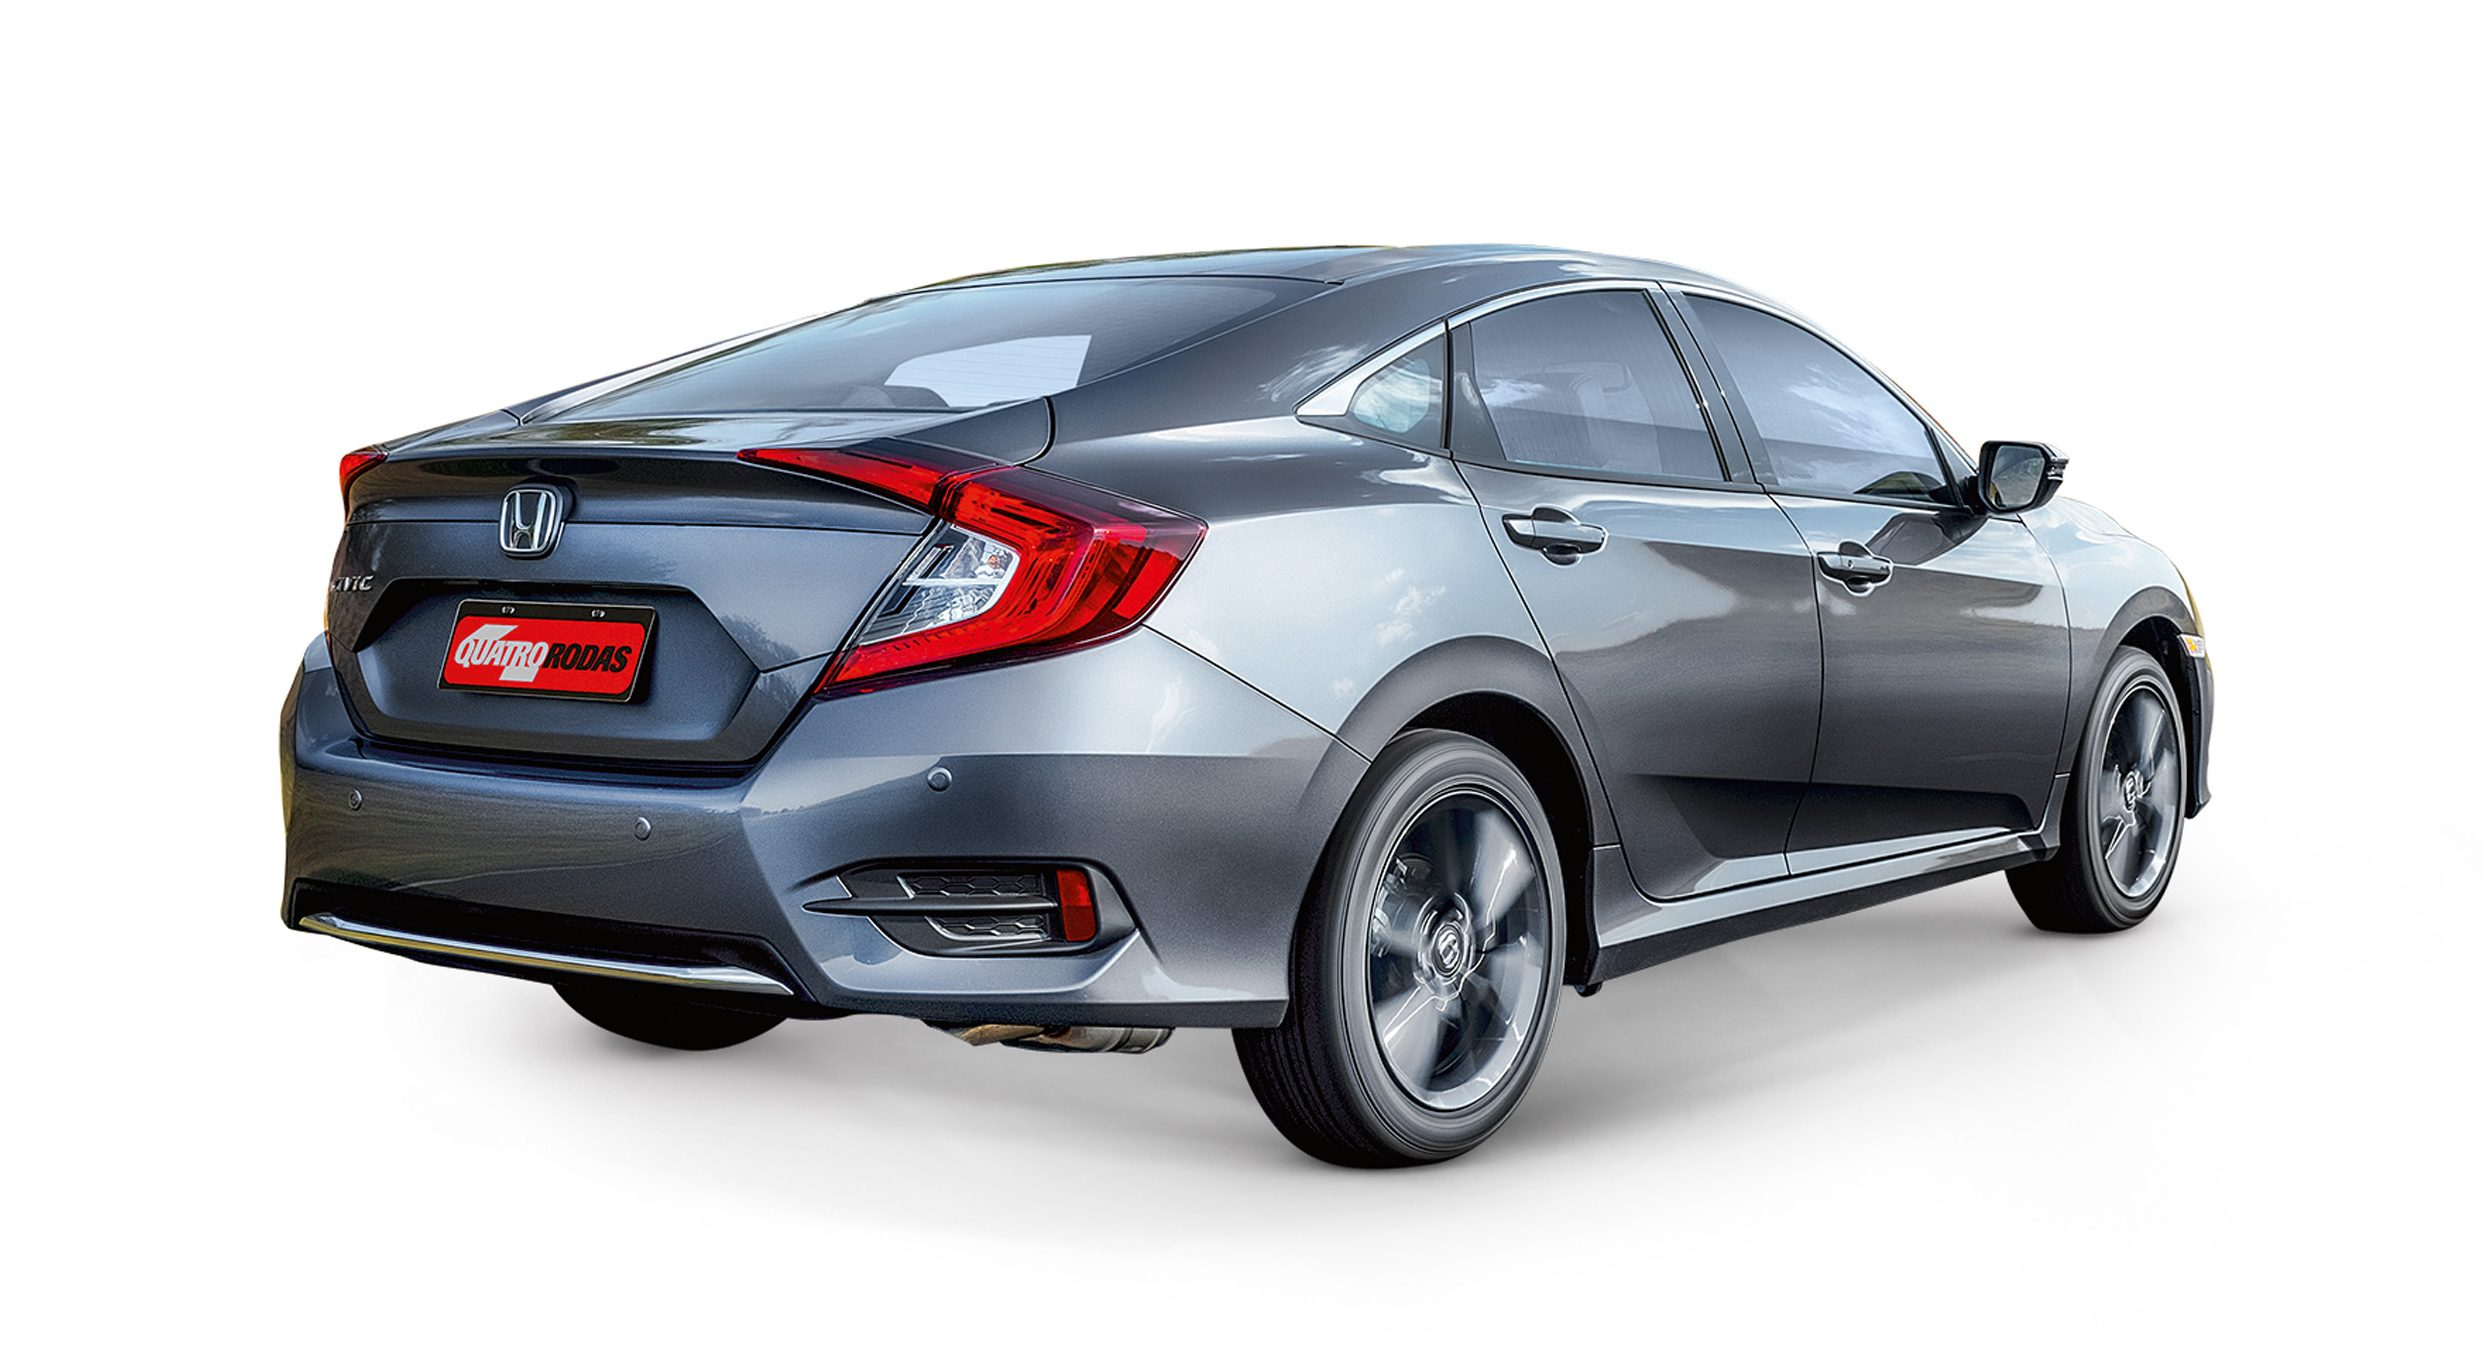 Honda Civic EX 2.0 AT